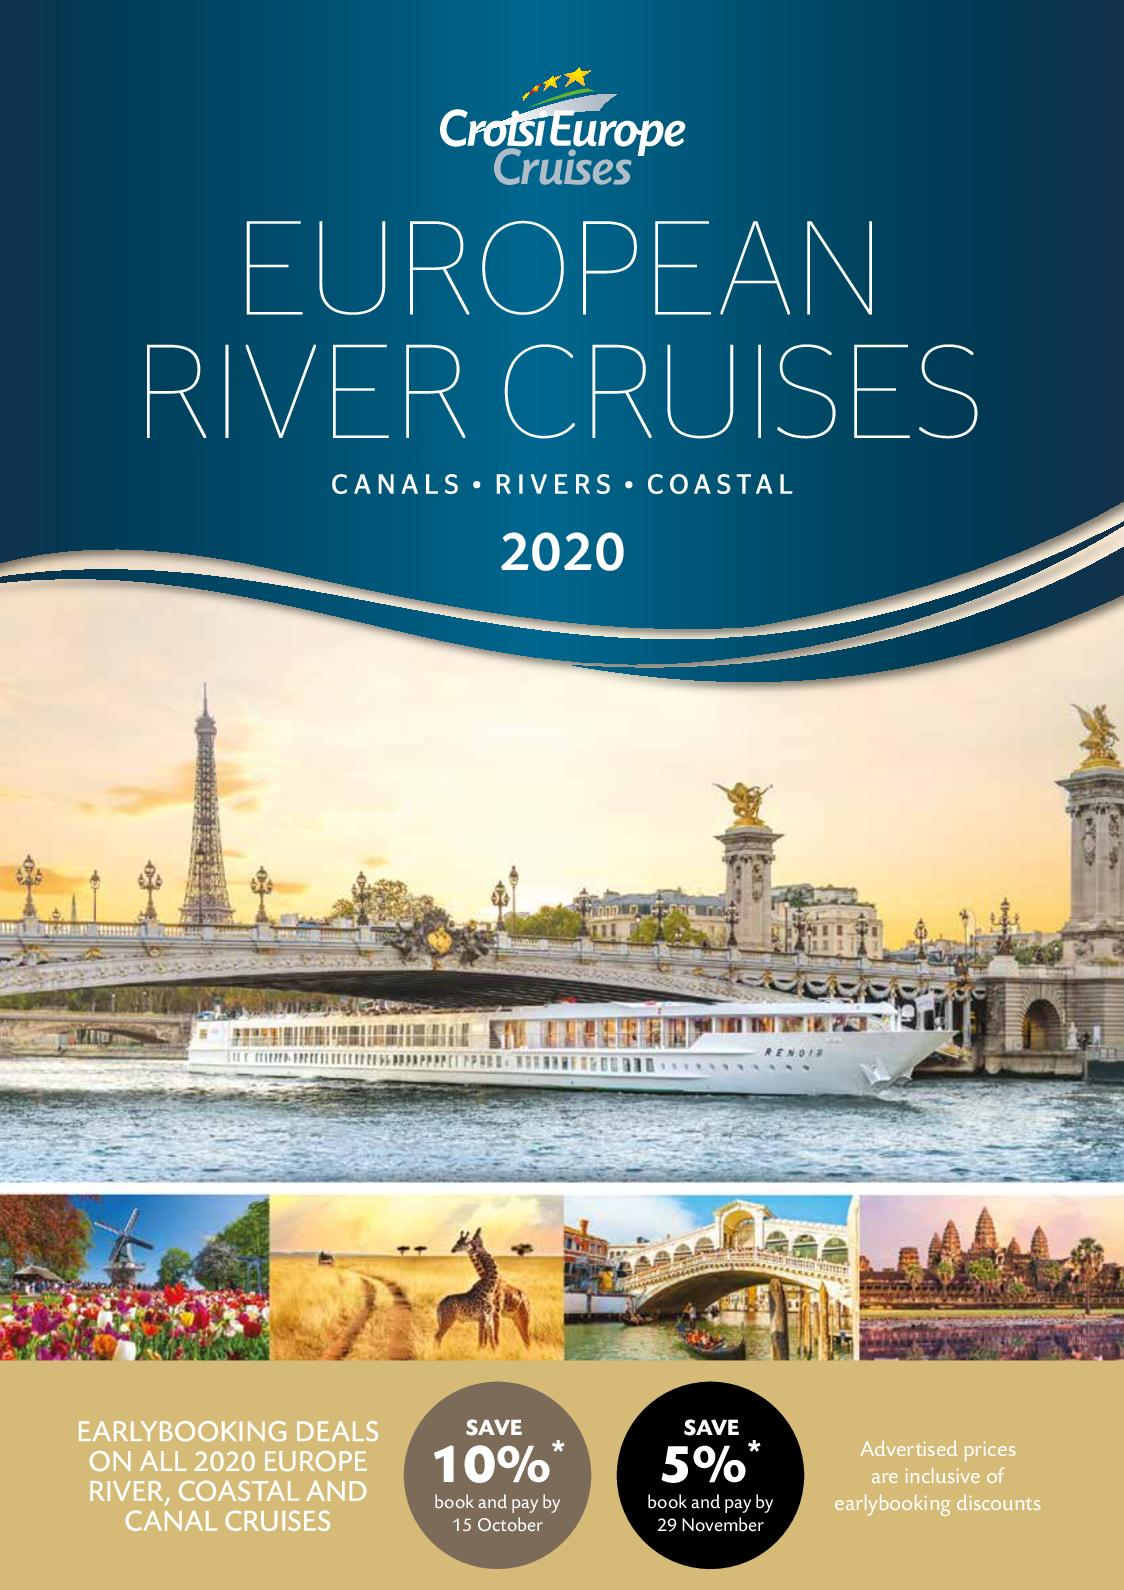 European River Cruises >> Calameo Croisi Europe 2020 European River Cruises Earlybird Ii